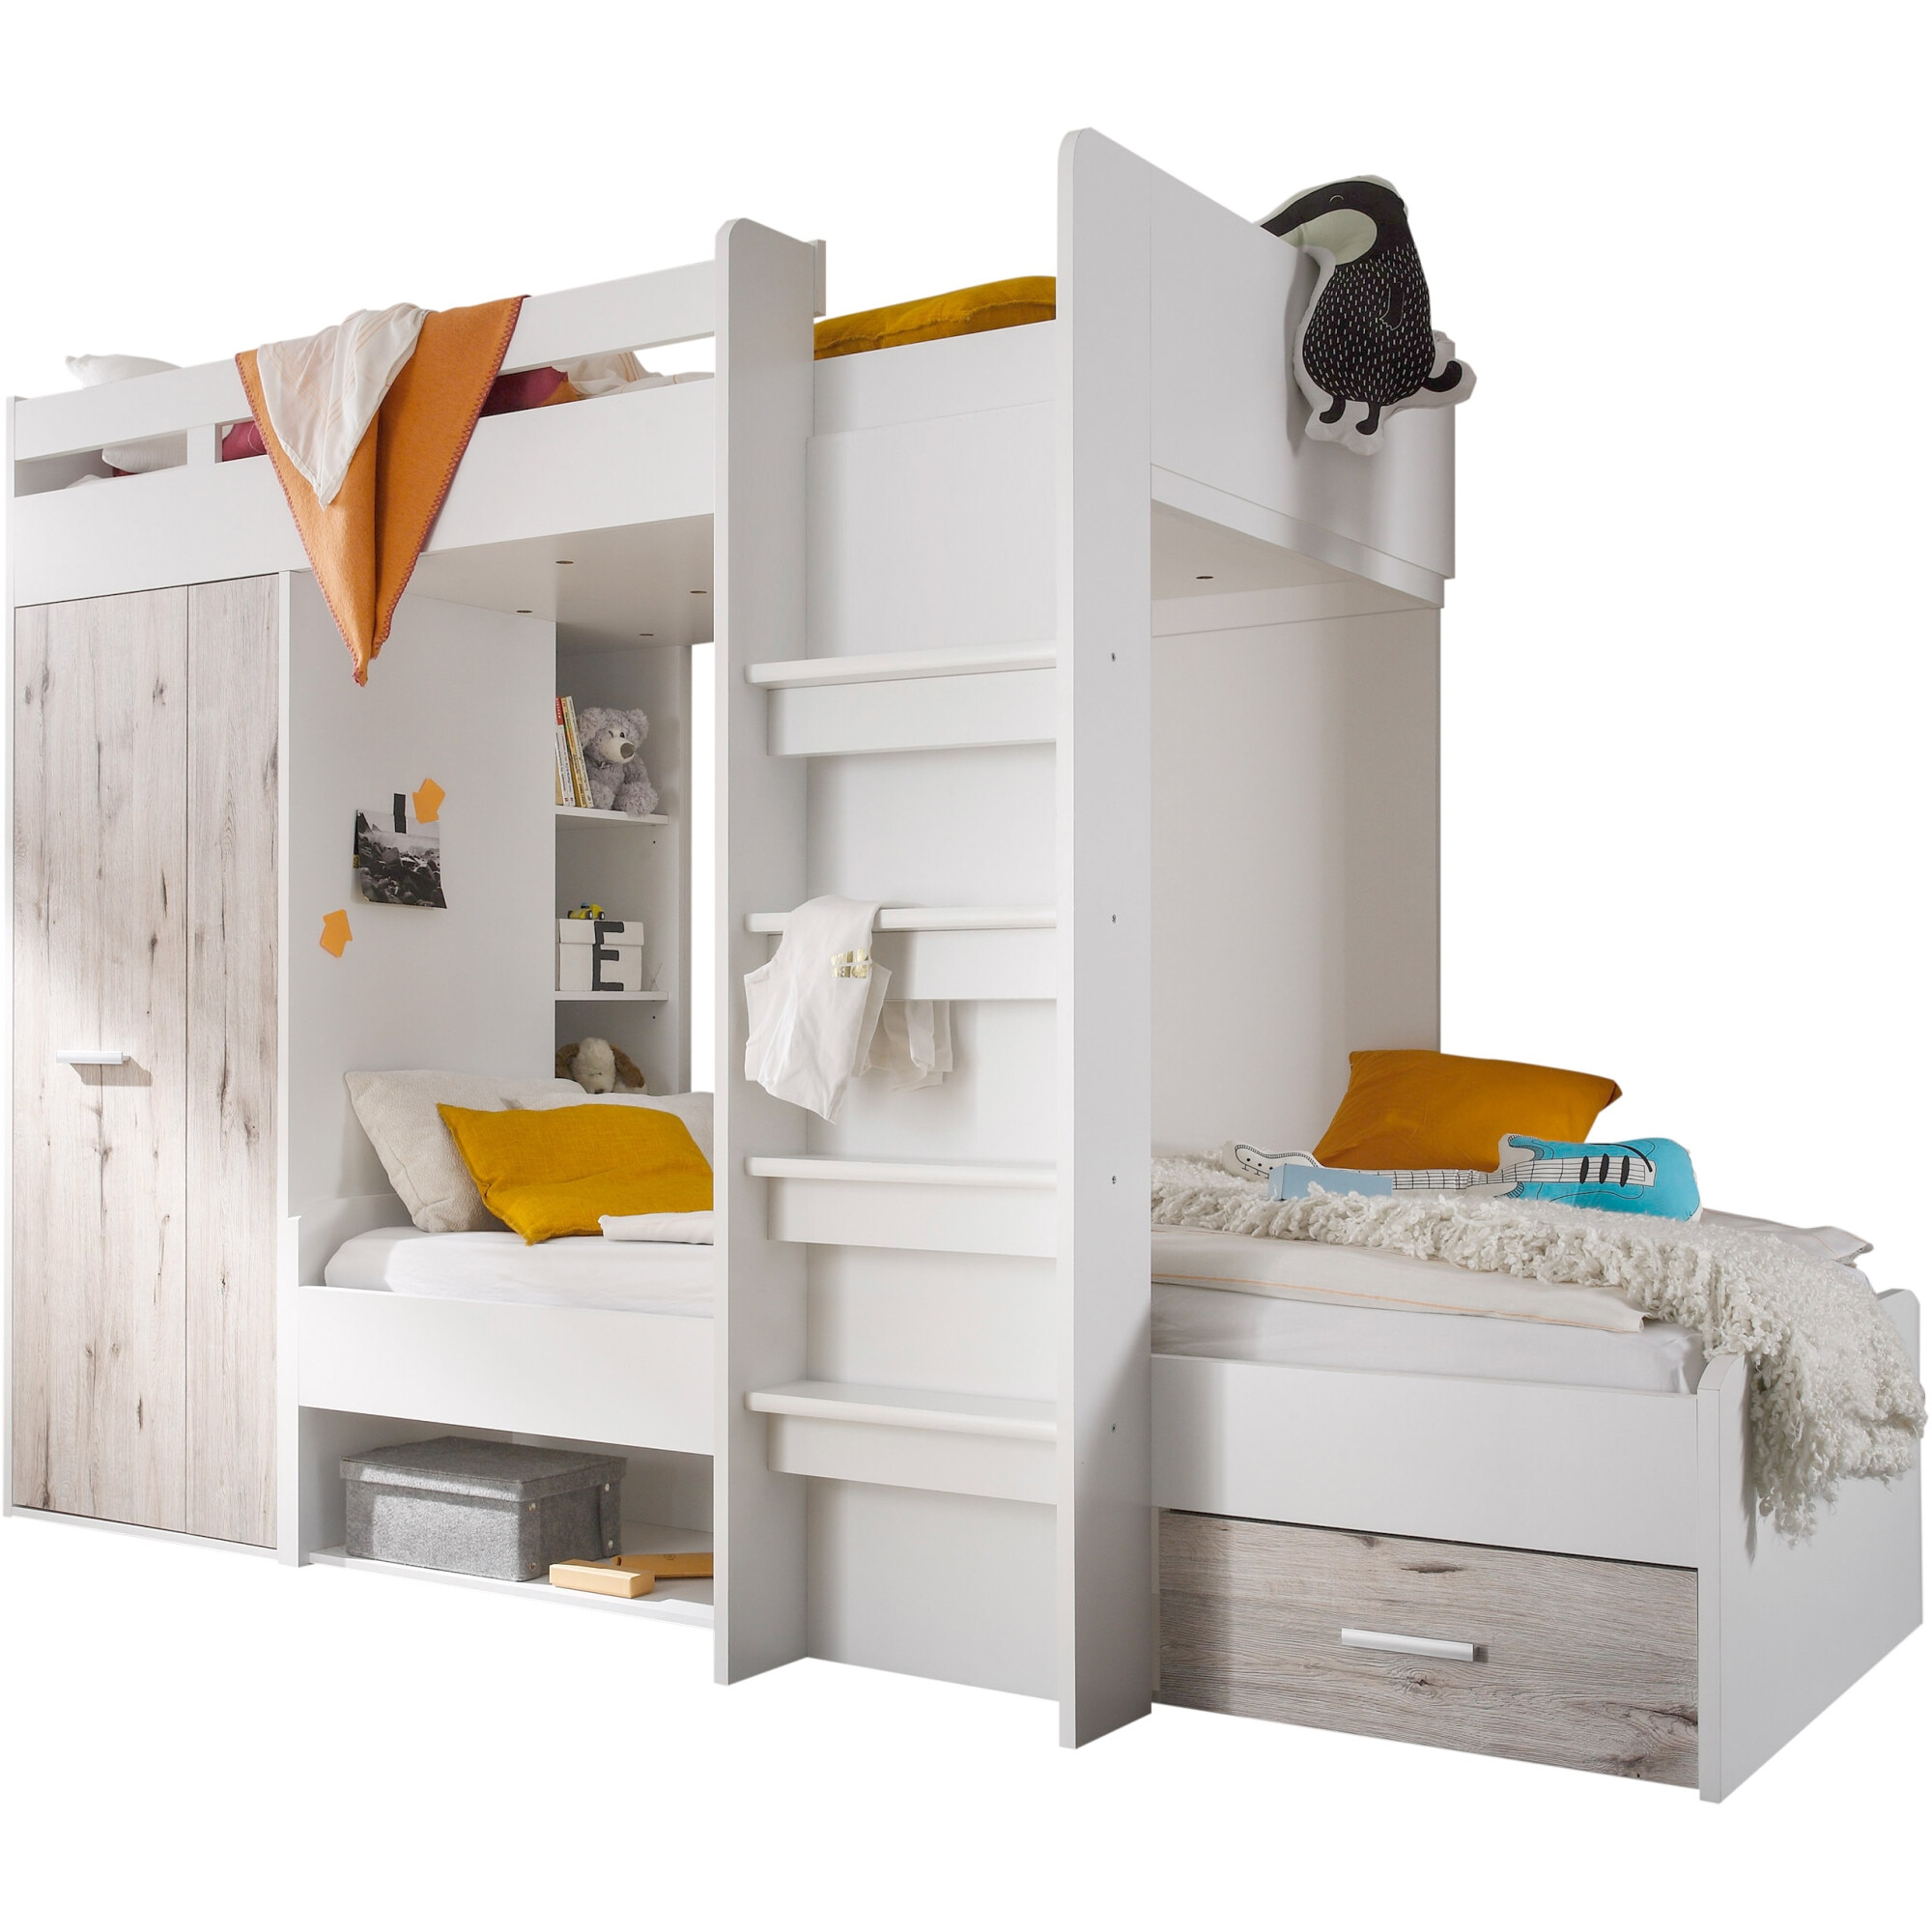 Fotografie Dormitor tineret Maxi, 269x115x180 cm, 2 paturi 90x200 cm, dulap, raft, Culoare Alb, Stejar Nisip